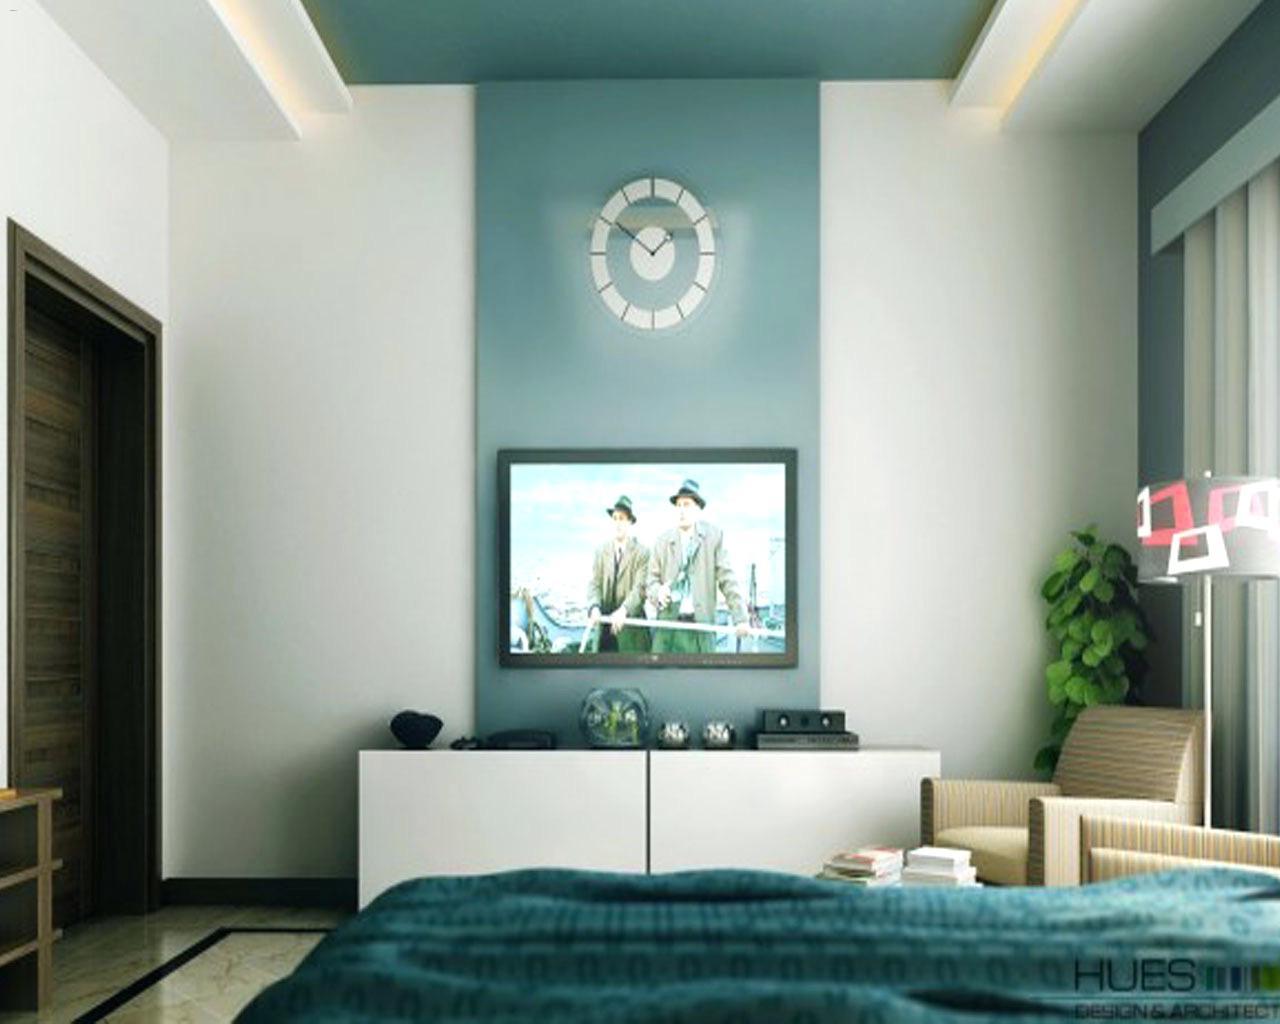 wallpaper ideas for living room feature wall cupboard designs of fo 7881 acnn decor wallwallpaper